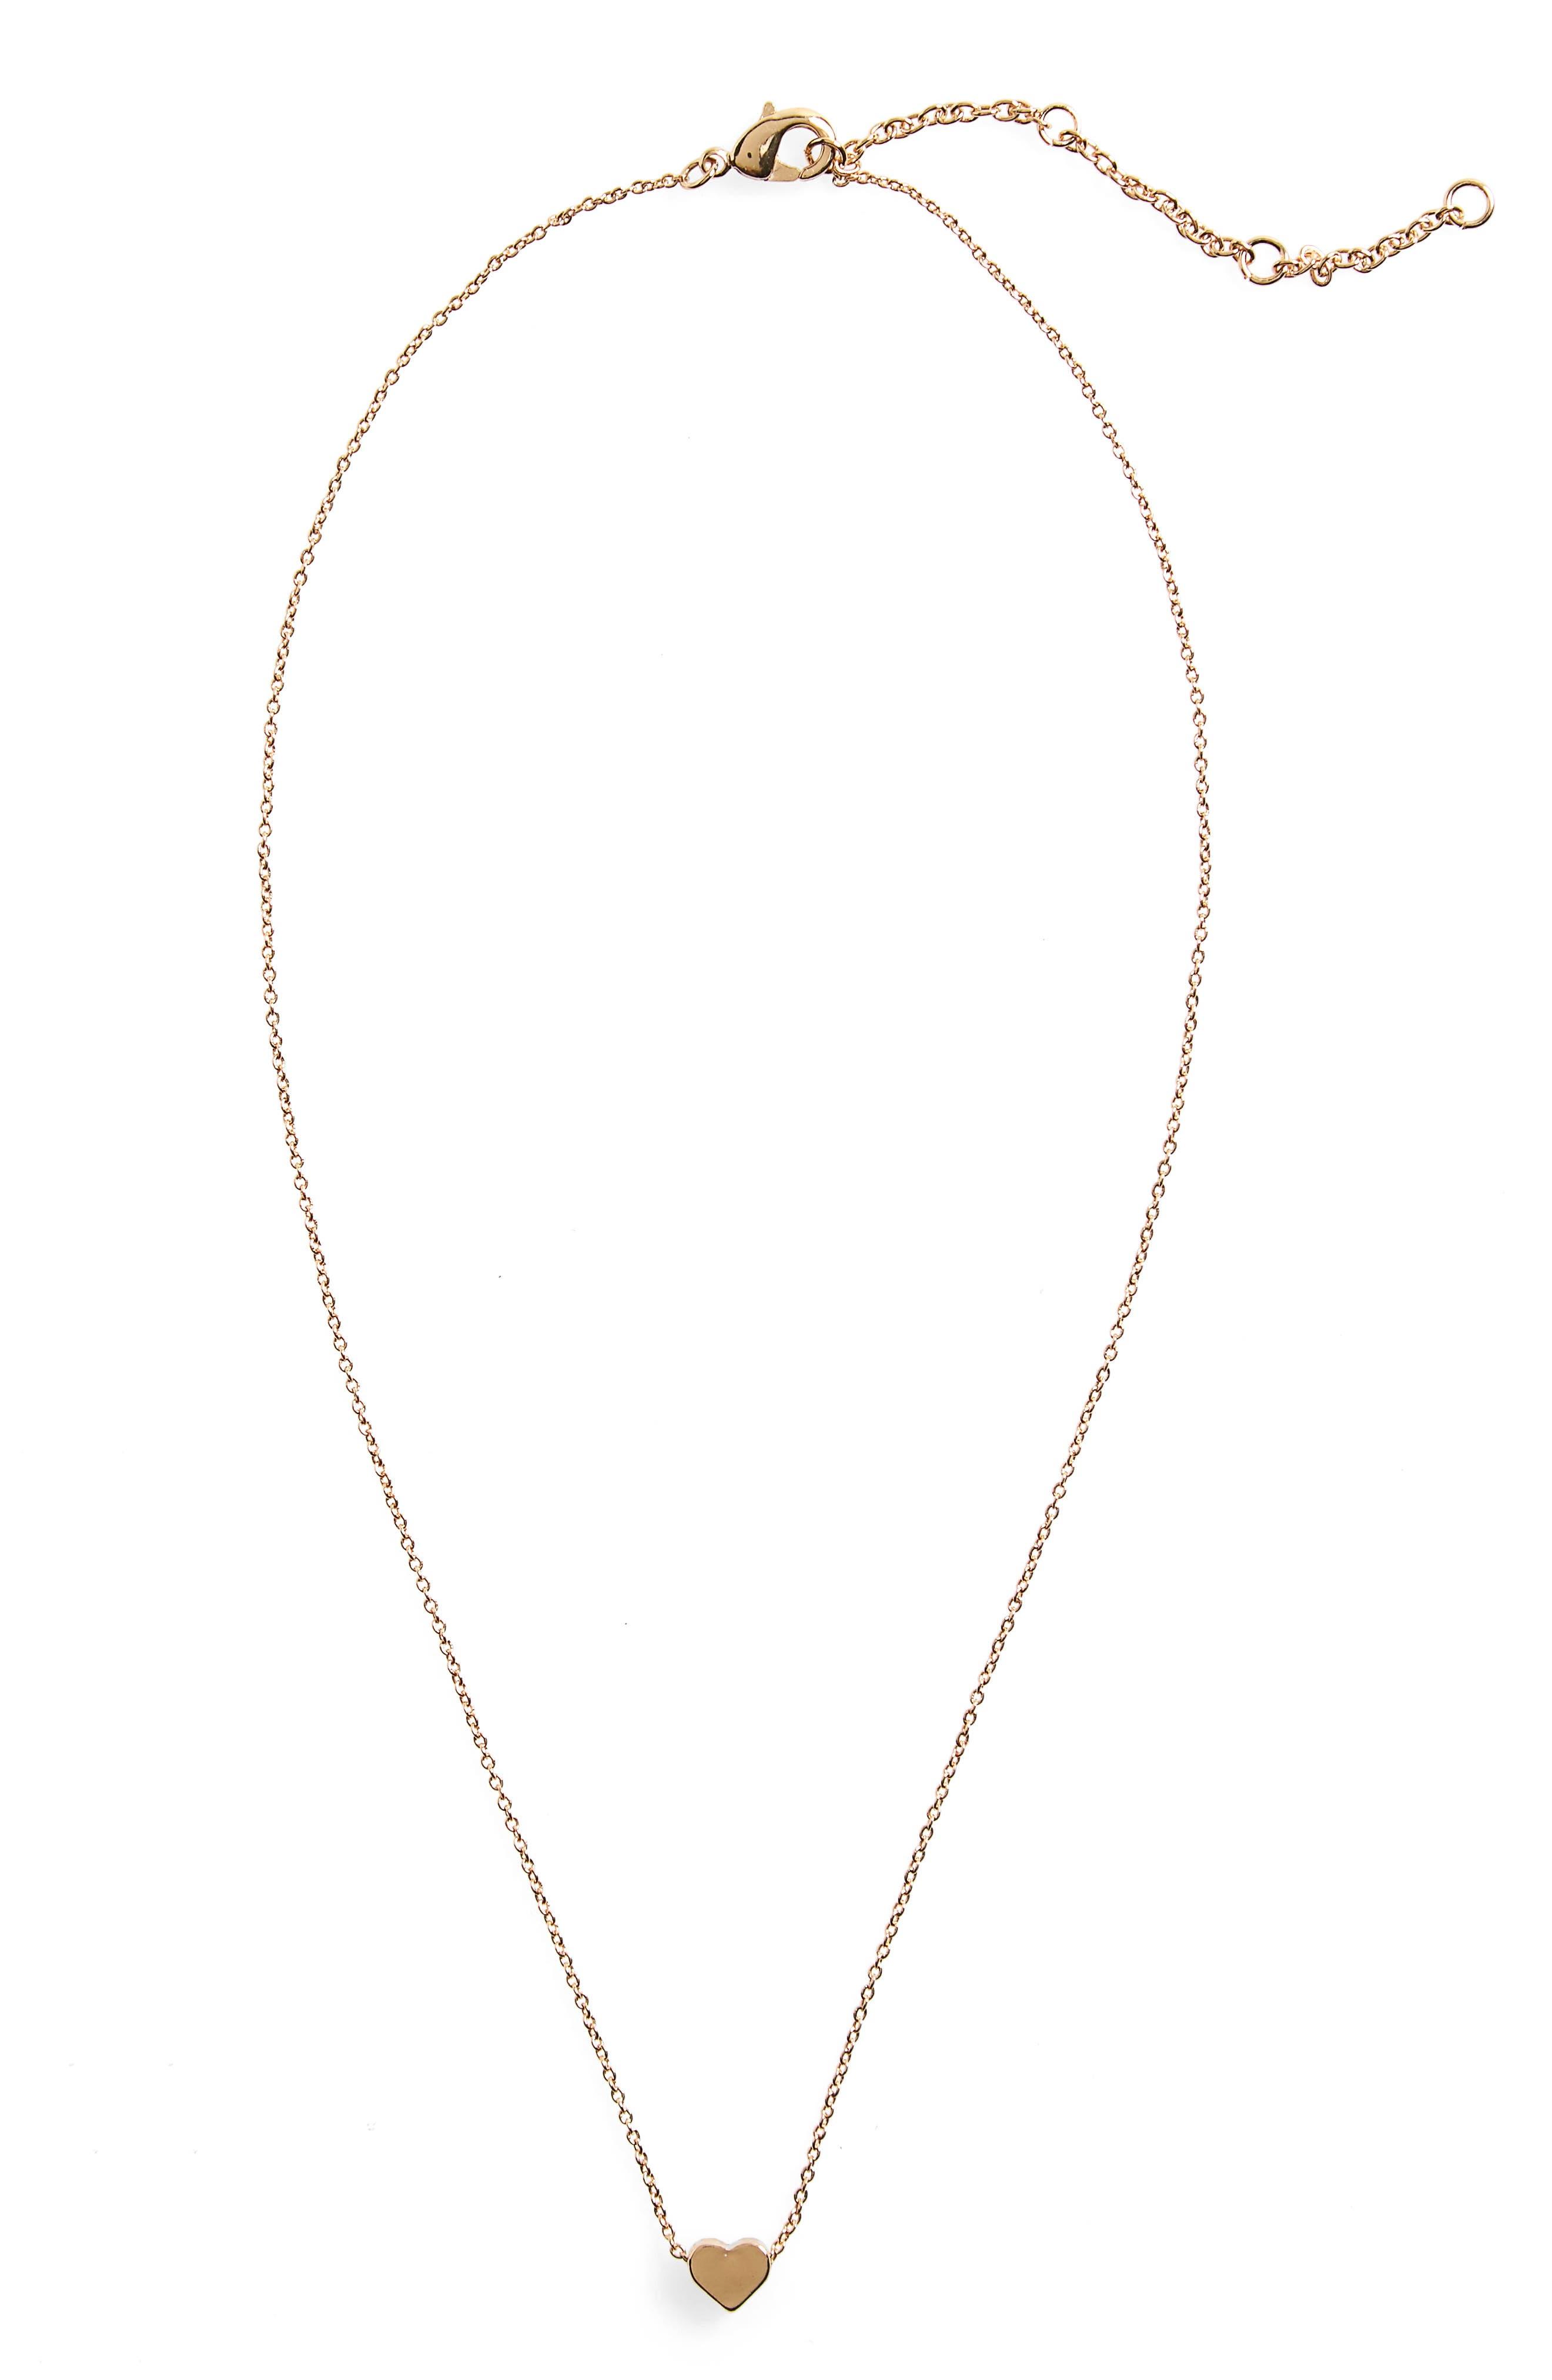 Heart Necklace,                             Main thumbnail 1, color,                             710